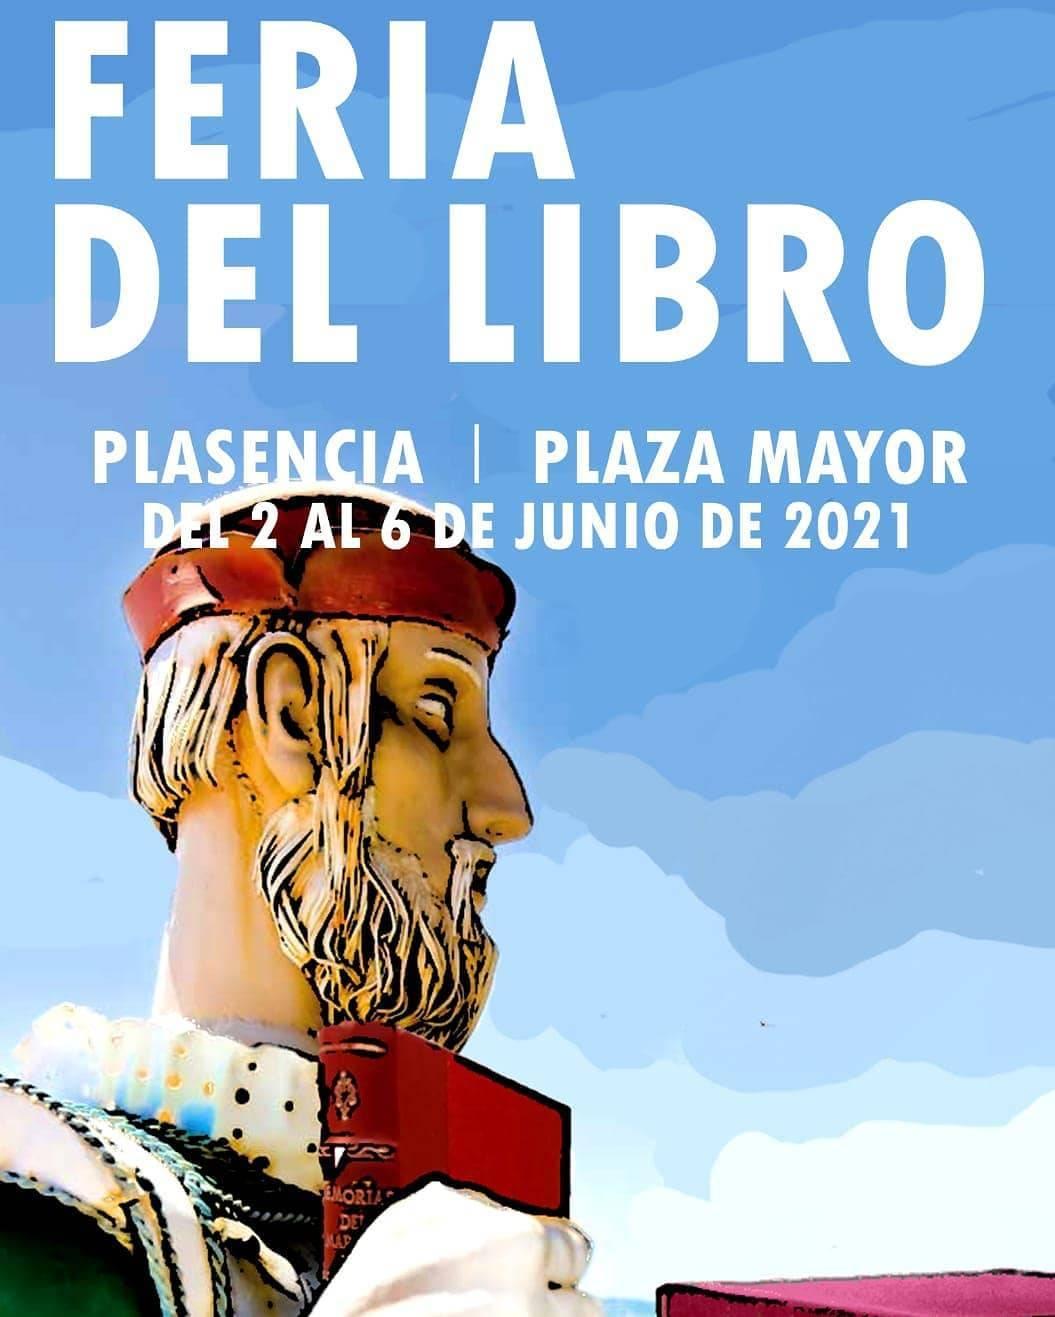 Feria del libro (2021) - Plasencia (Cáceres)